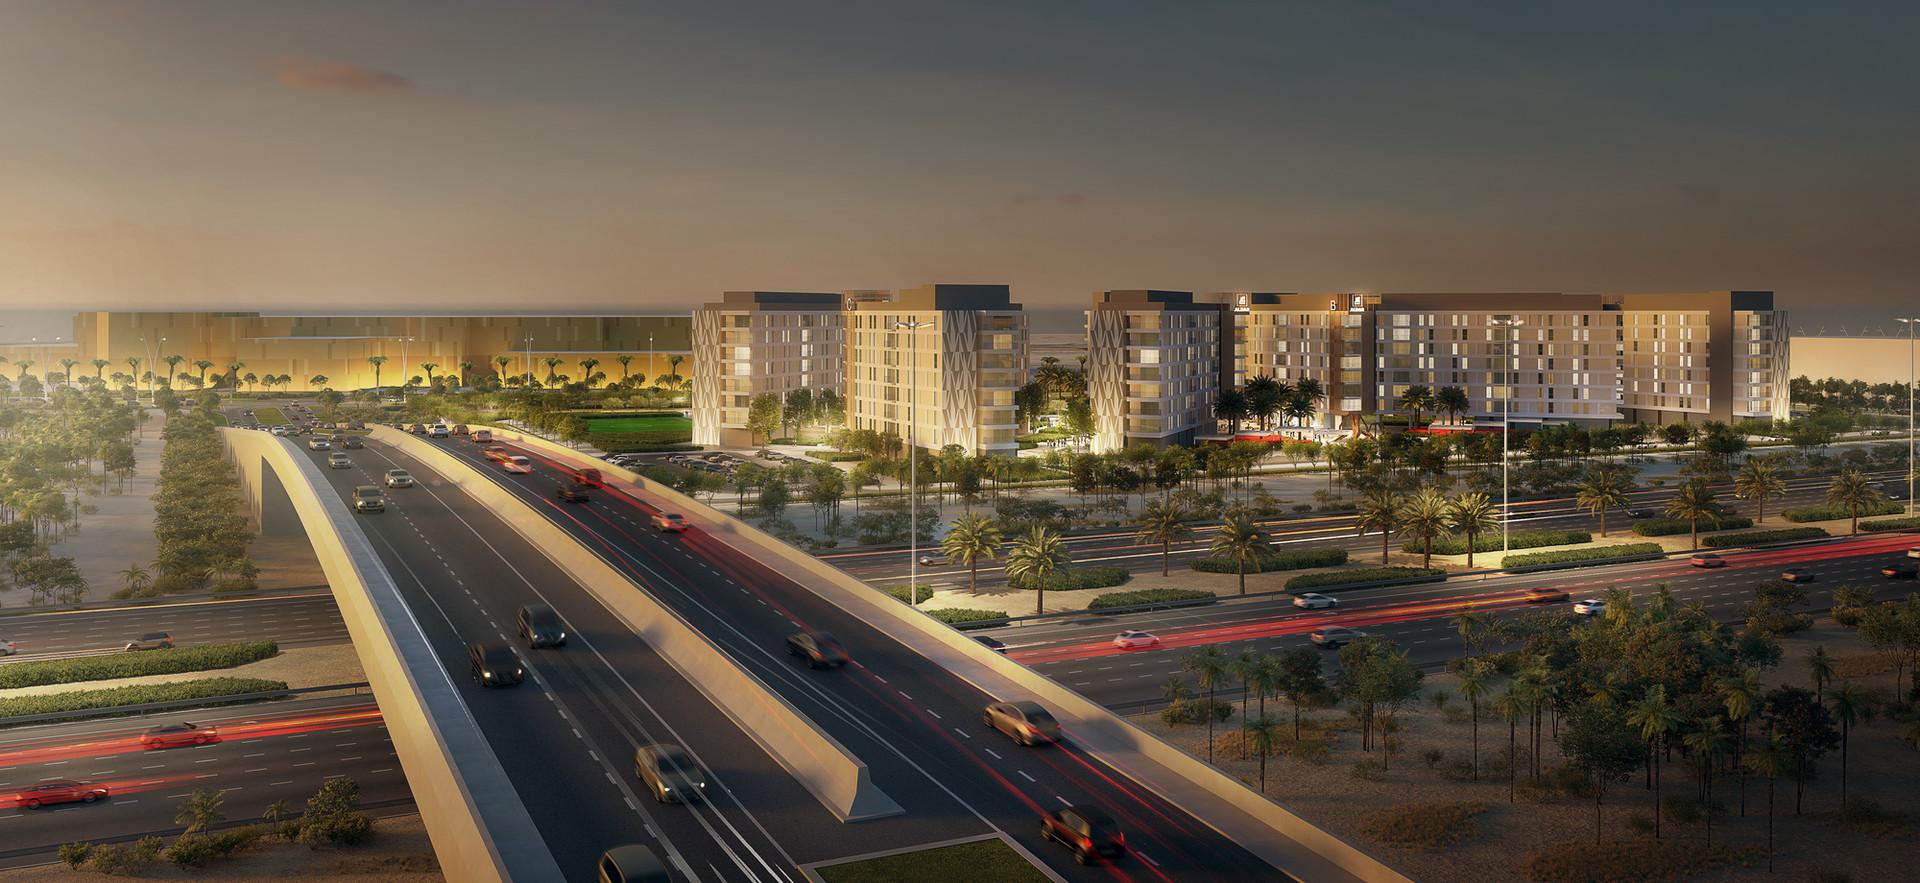 Yas Staff Accommodation, Abu Dhabi